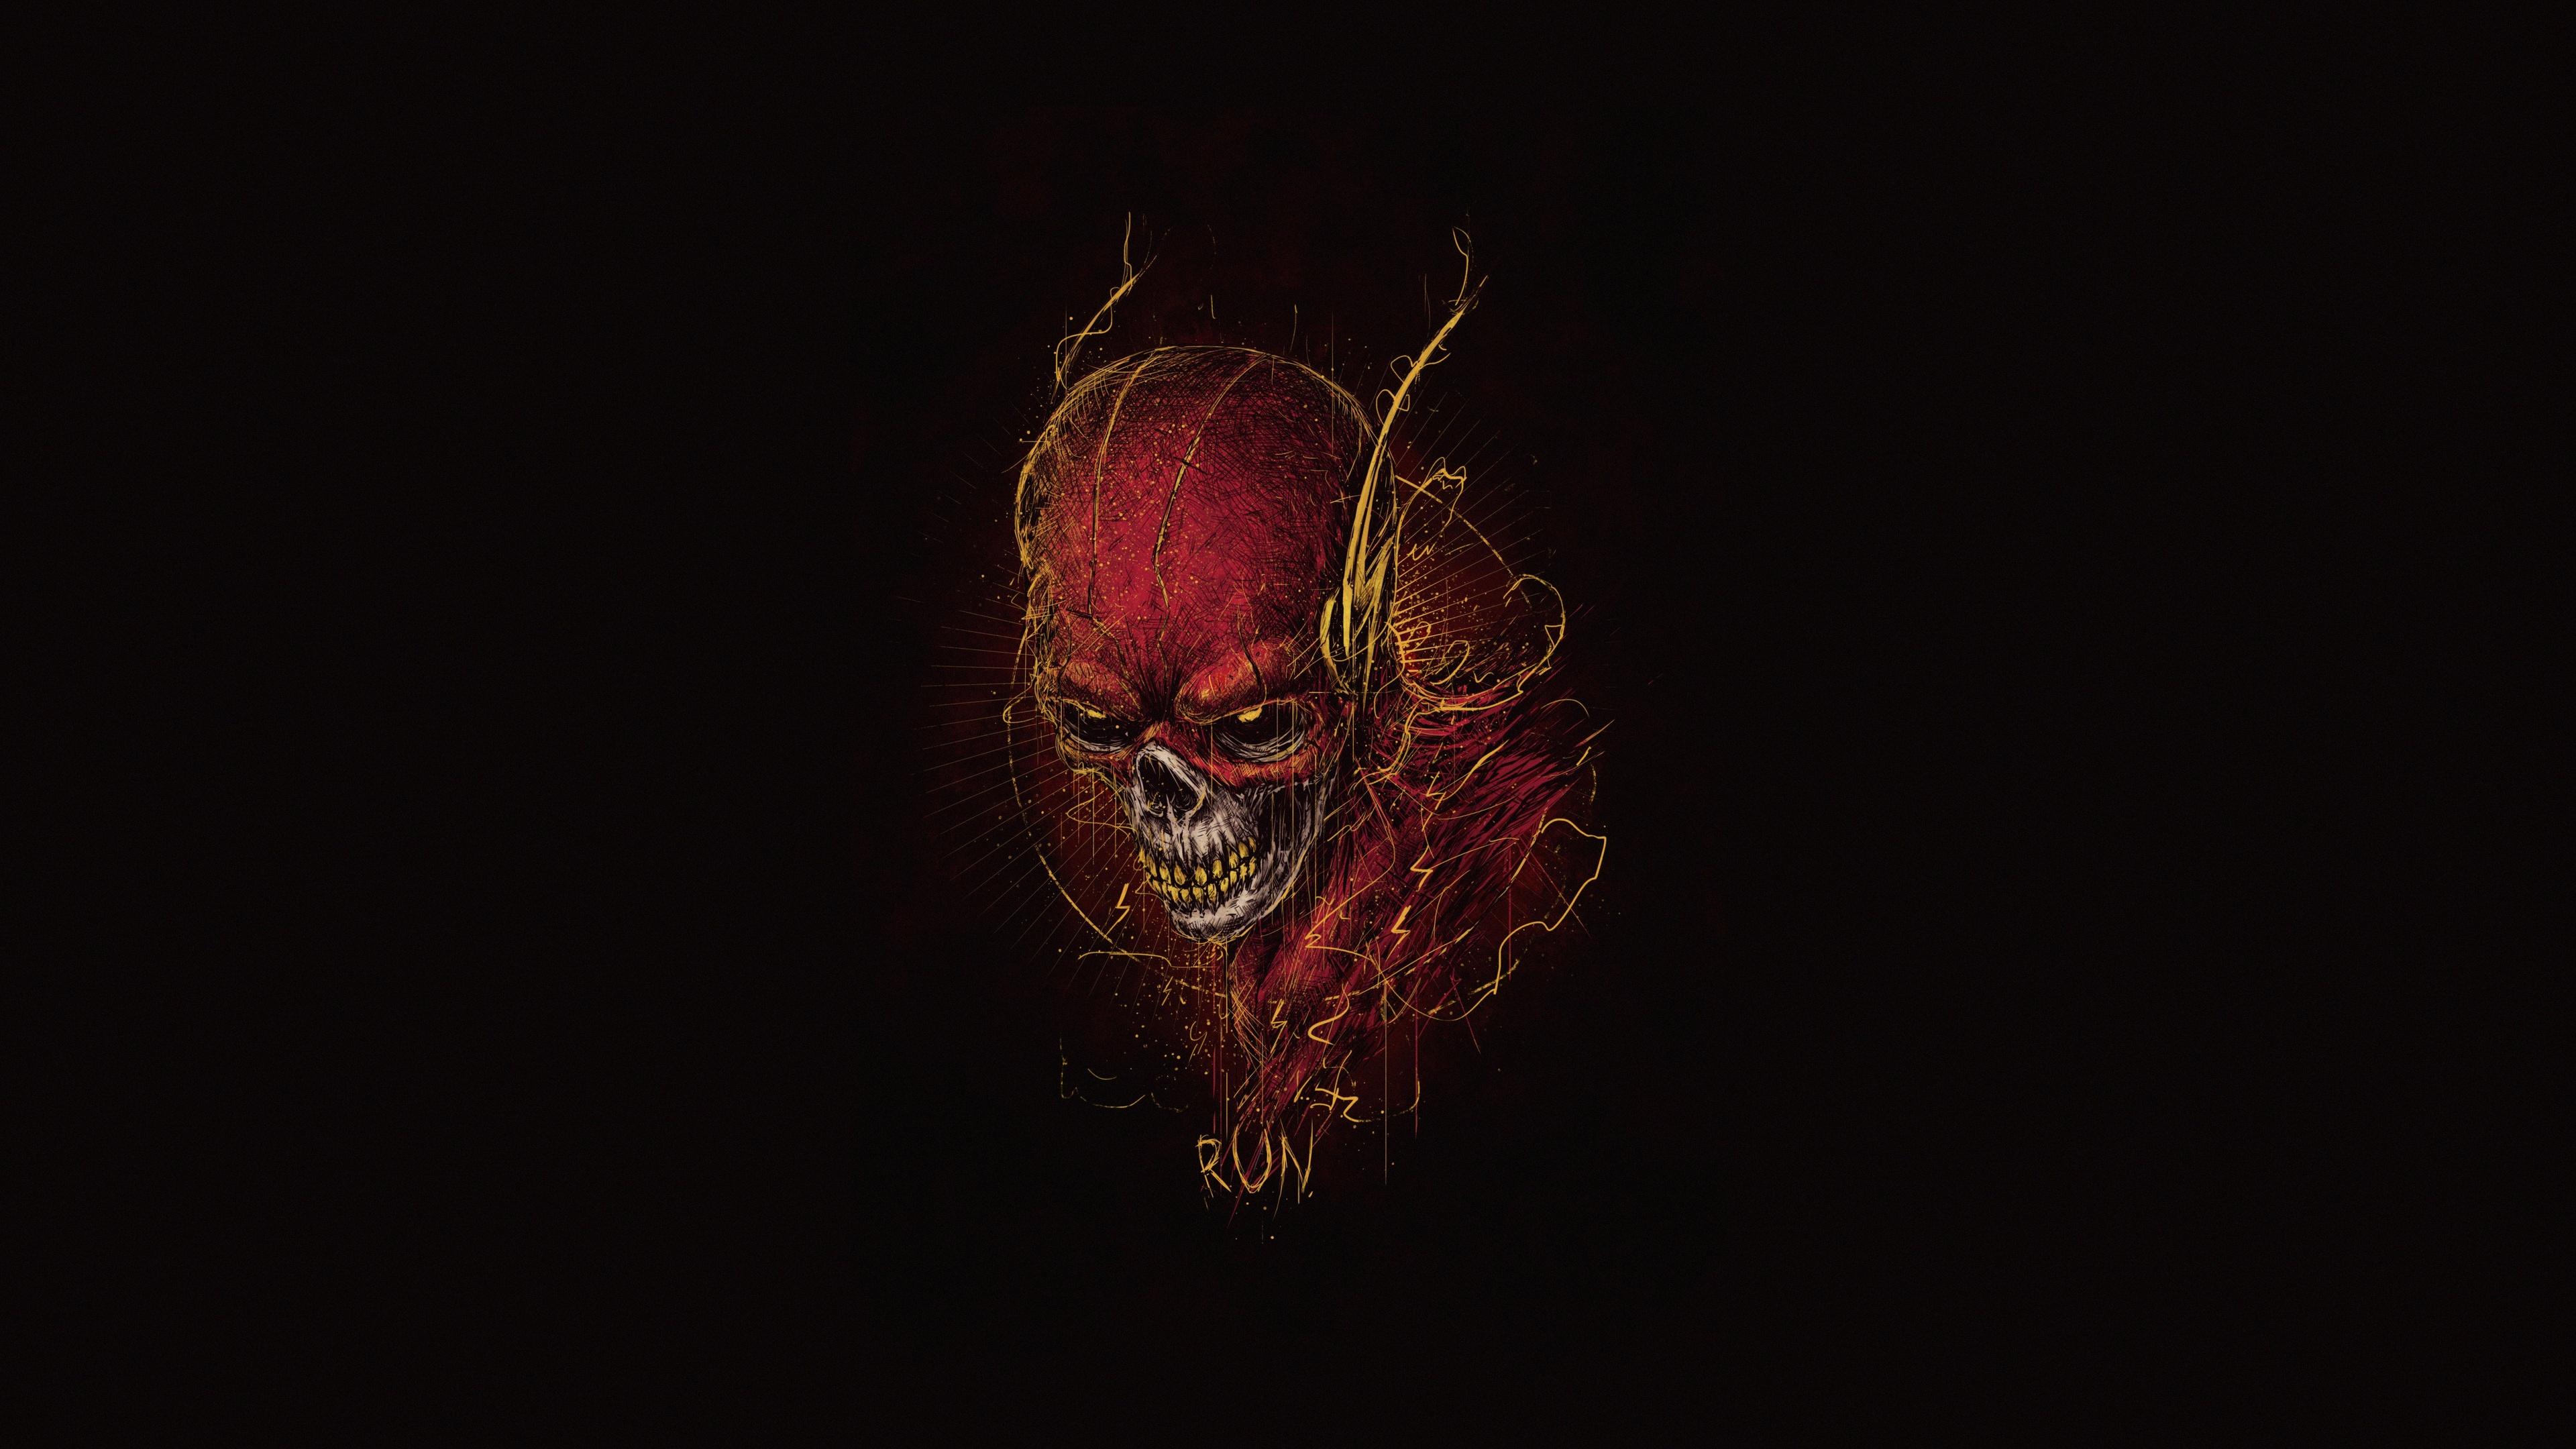 flash skull 1568054444 - Flash Skull - superheroes wallpapers, skull wallpapers, hd-wallpapers, flash wallpapers, digital art wallpapers, artwork wallpapers, artist wallpapers, 5k wallpapers, 4k-wallpapers